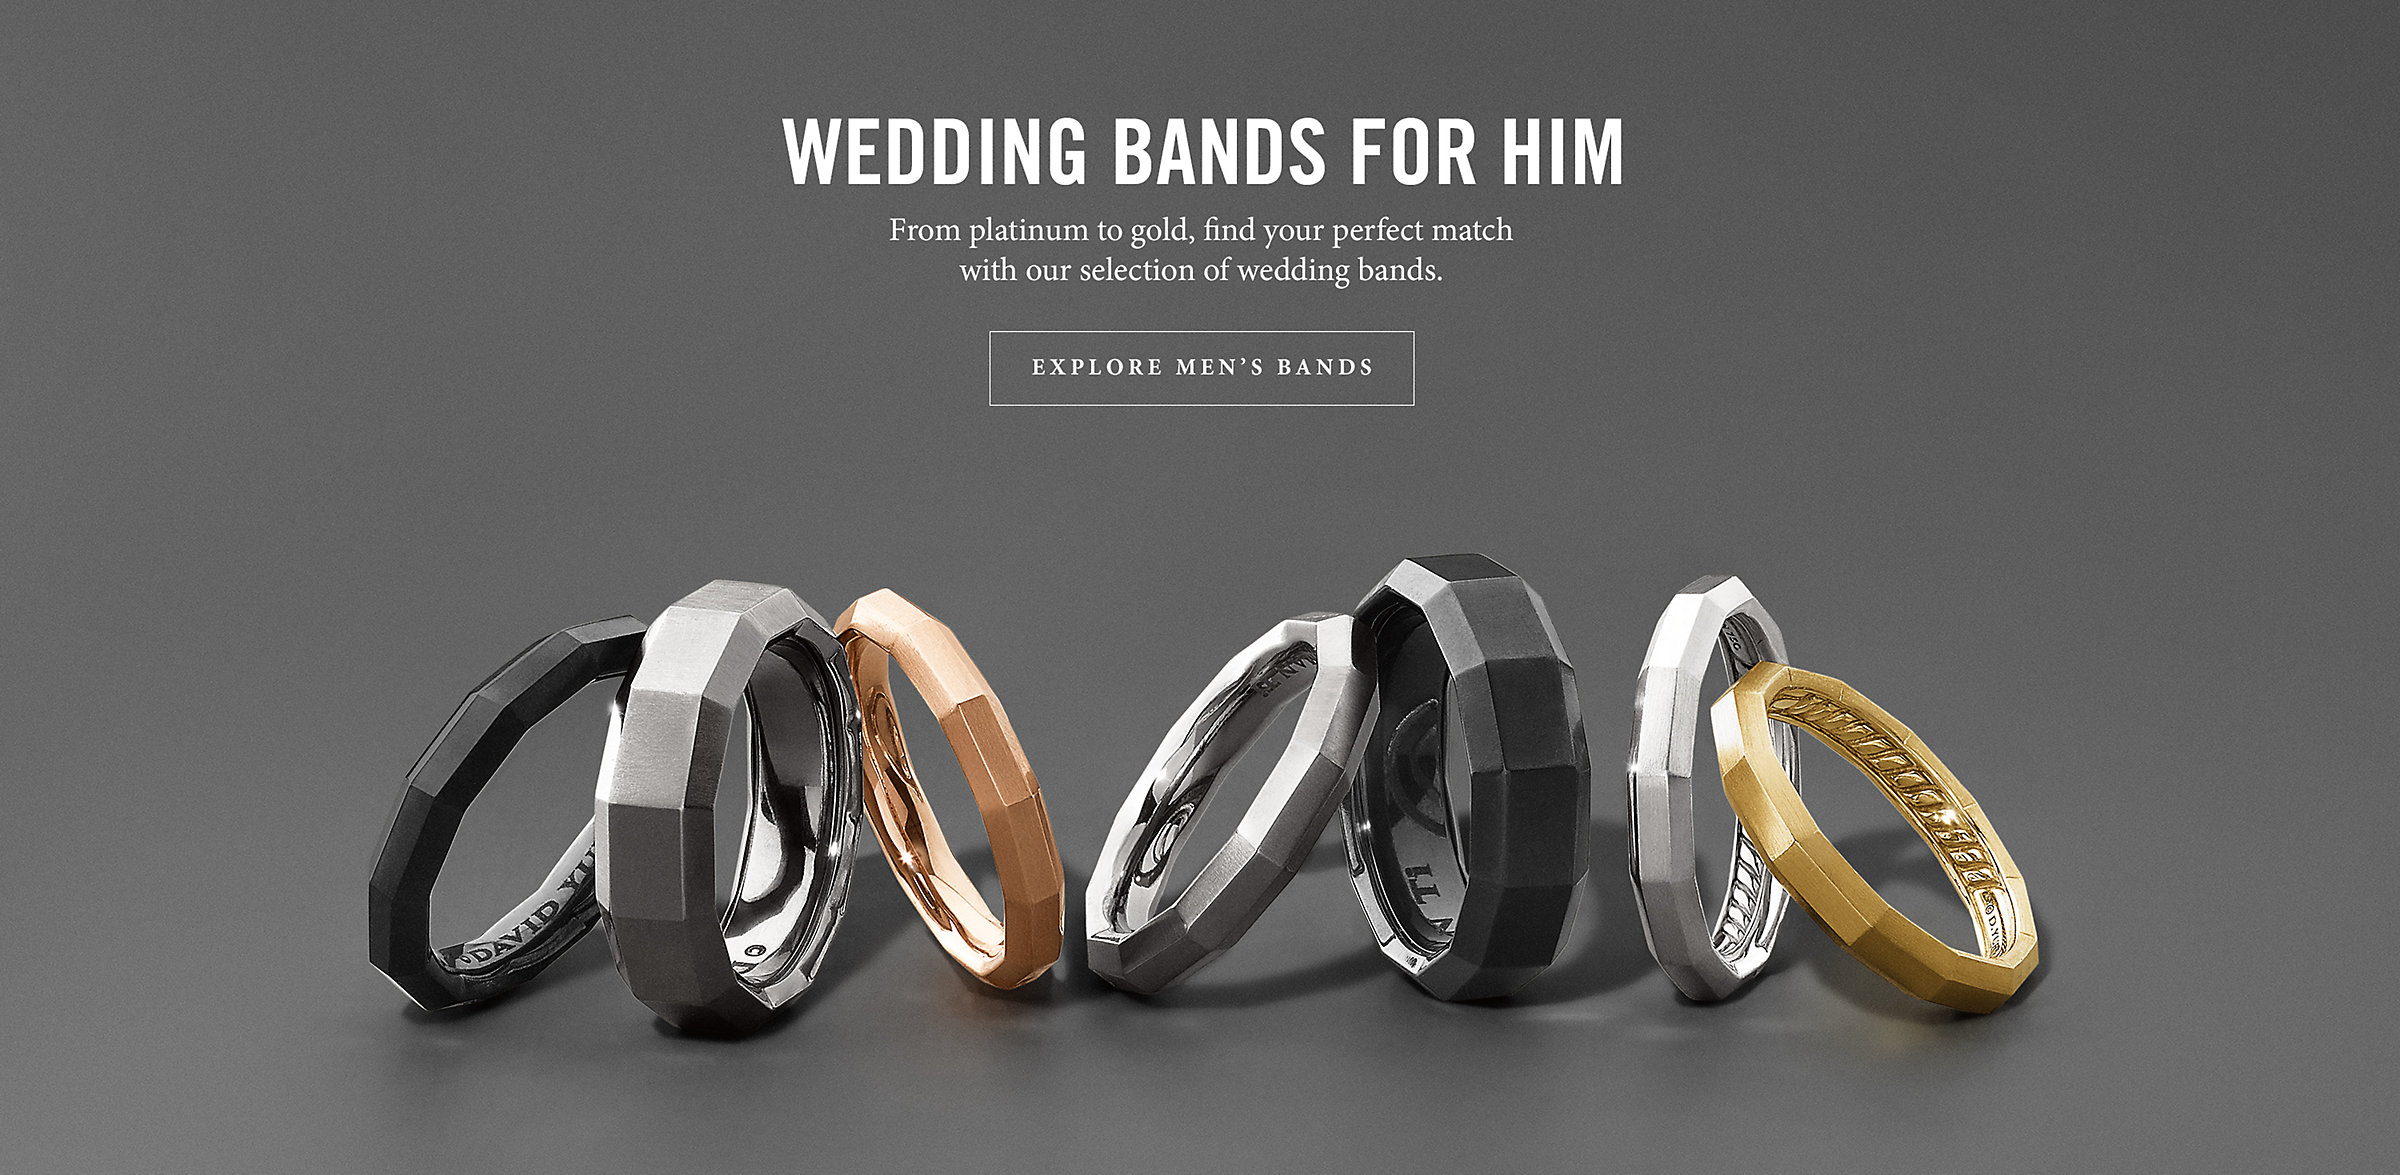 designer jewelry for women and men david yurman